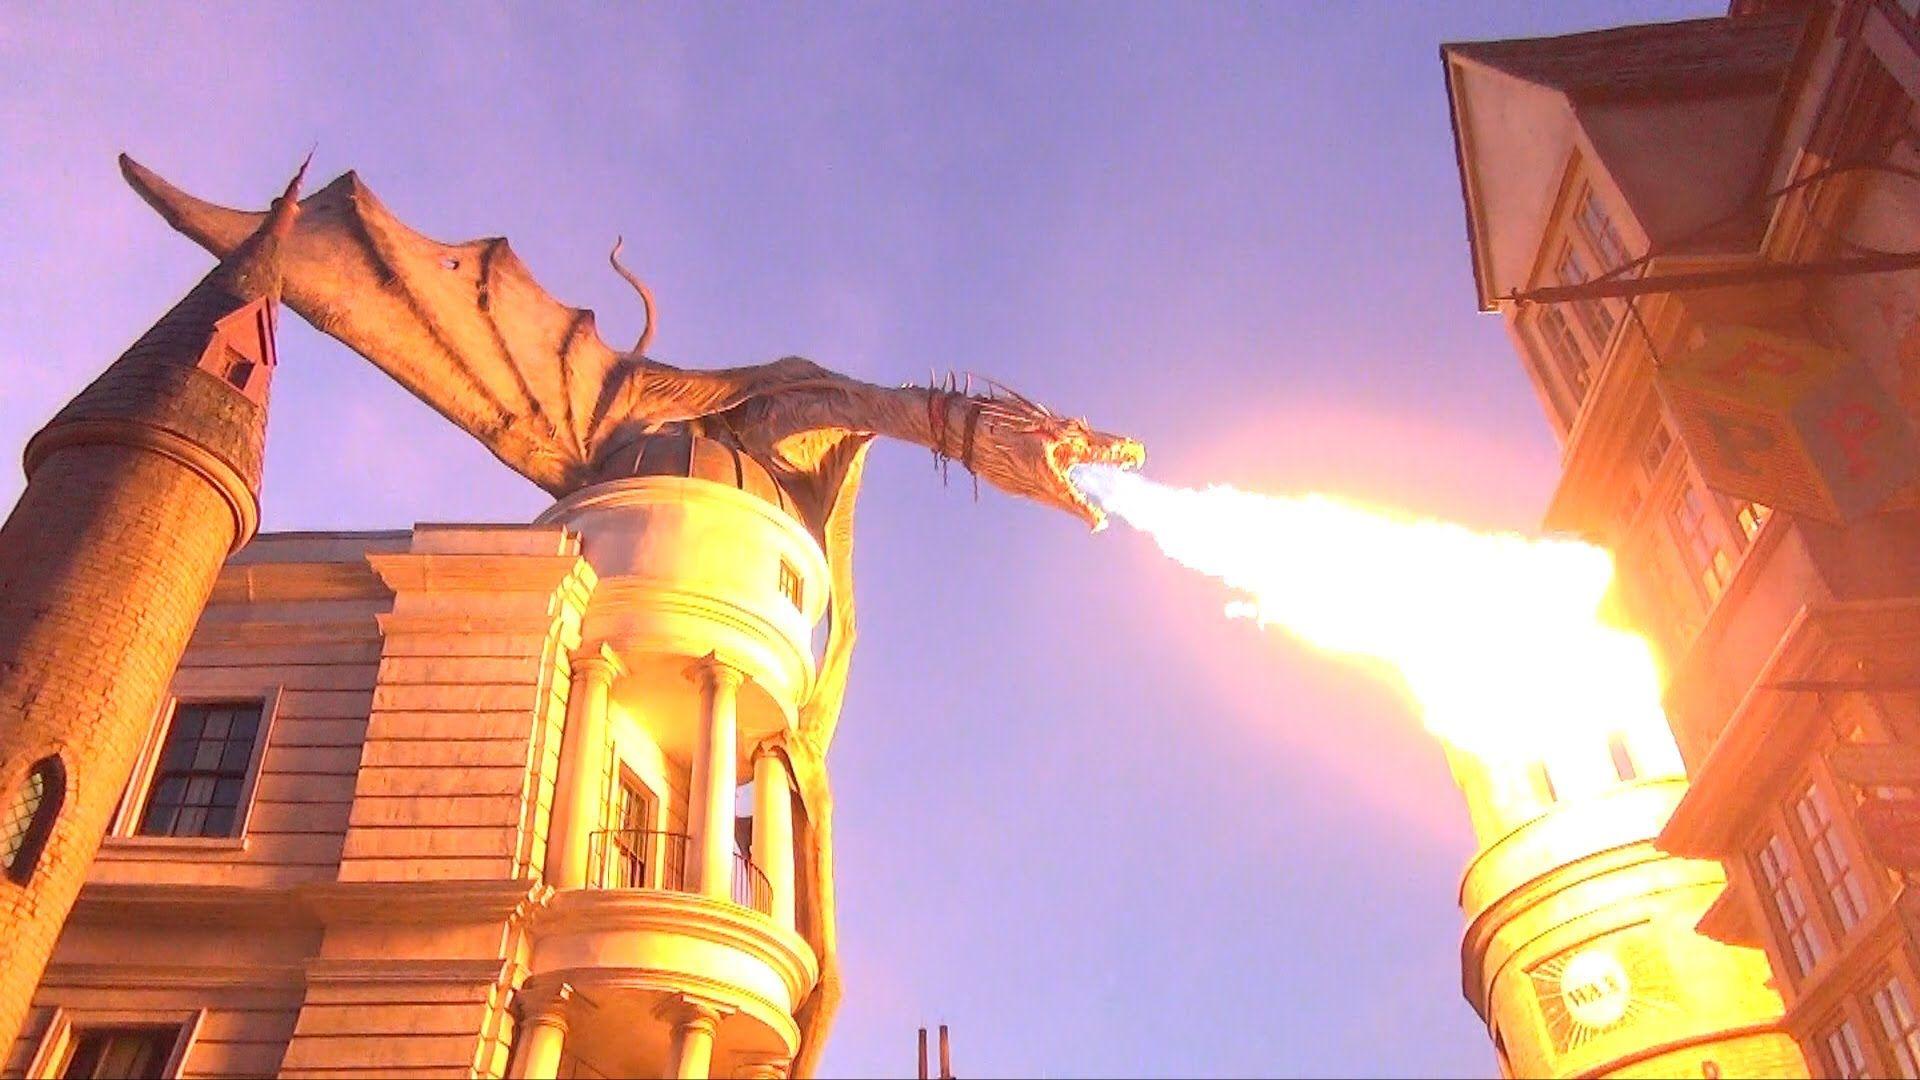 Diagon alley gringotts dragon breathes fire day into night diagon alley gringotts dragon breathes fire day into night ccuart Choice Image